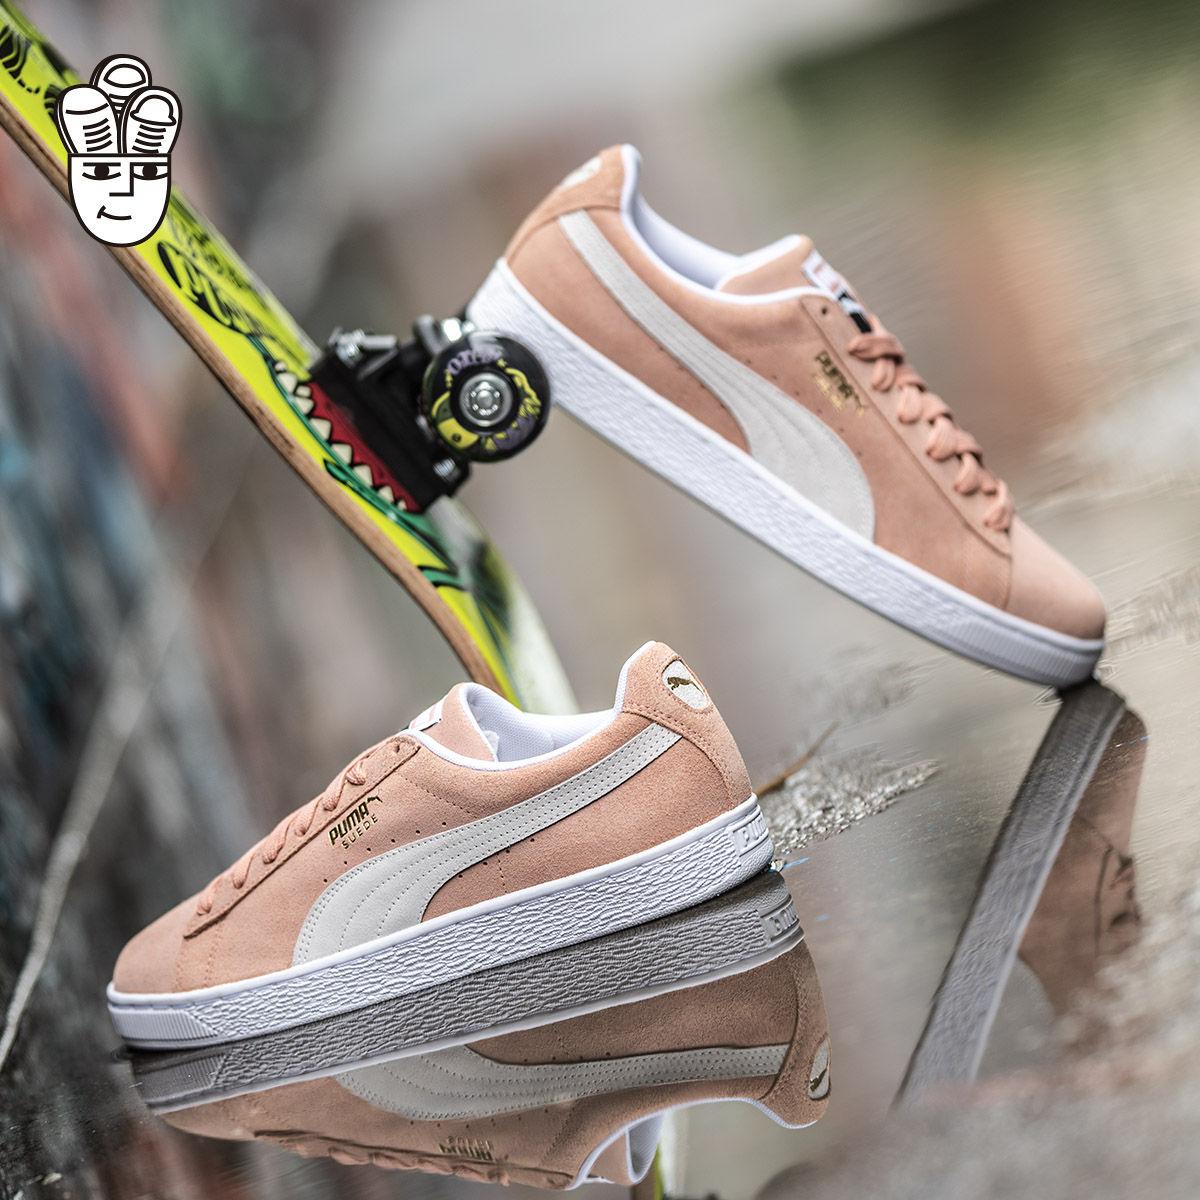 Puma Suede Classic + 彪马男鞋 经典低帮休闲板鞋 复古运动鞋